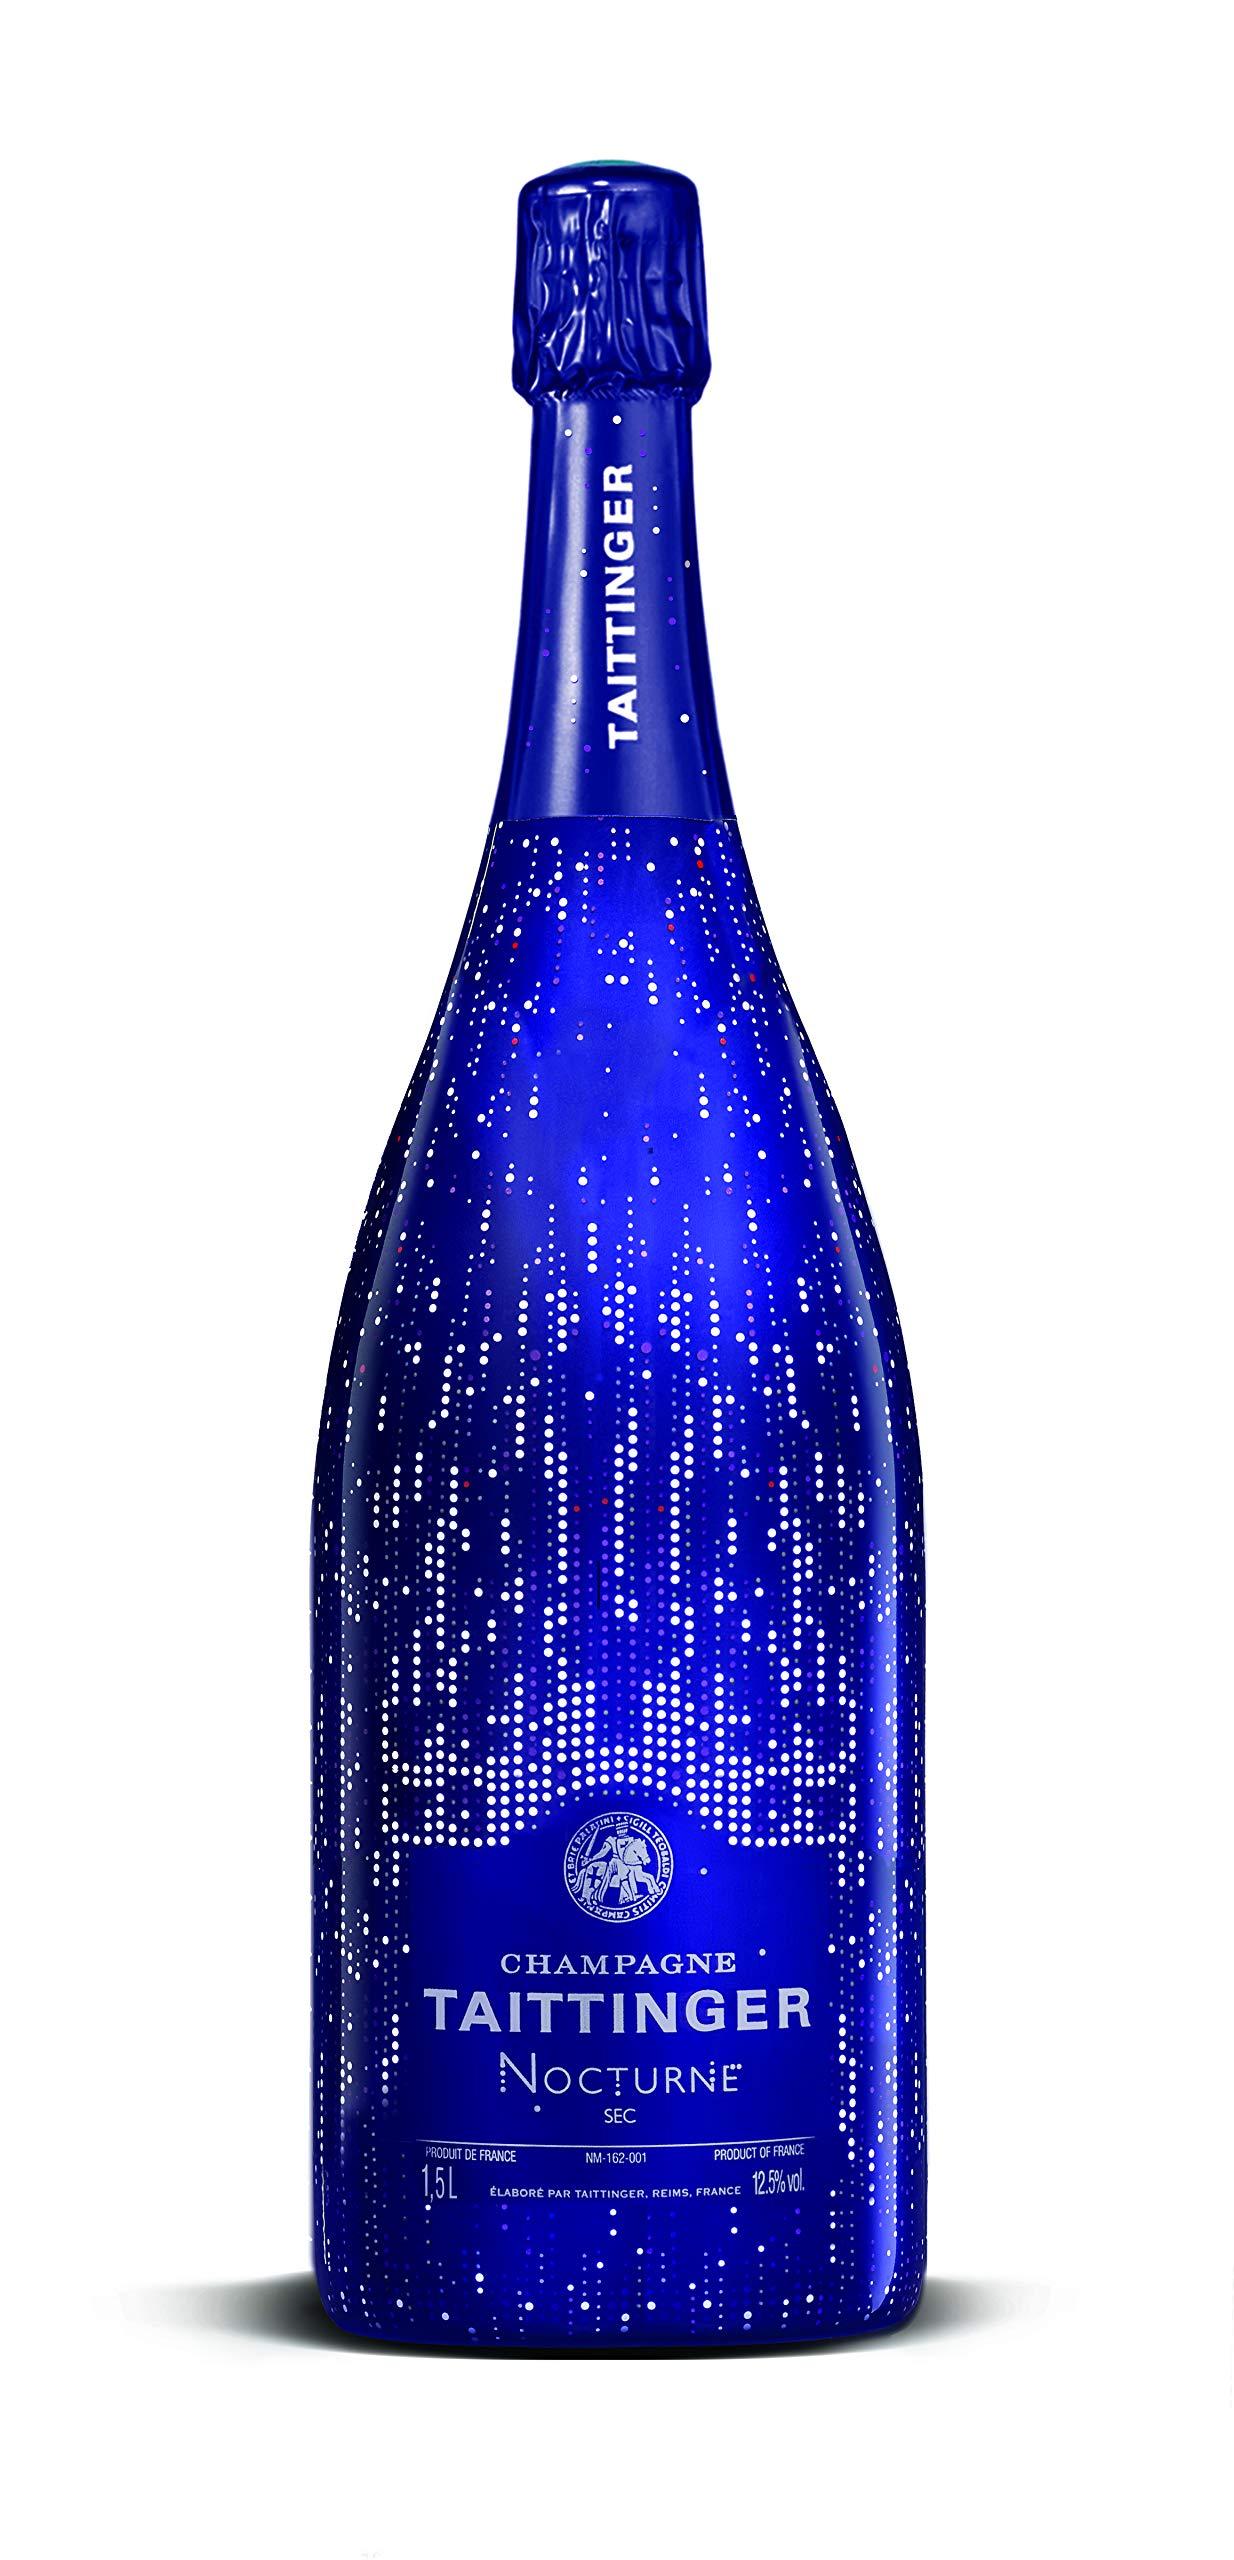 Taittinger-Champagner-15l-Doppelmagnum-Nocturne-City-Lights-Edition-125-Alk